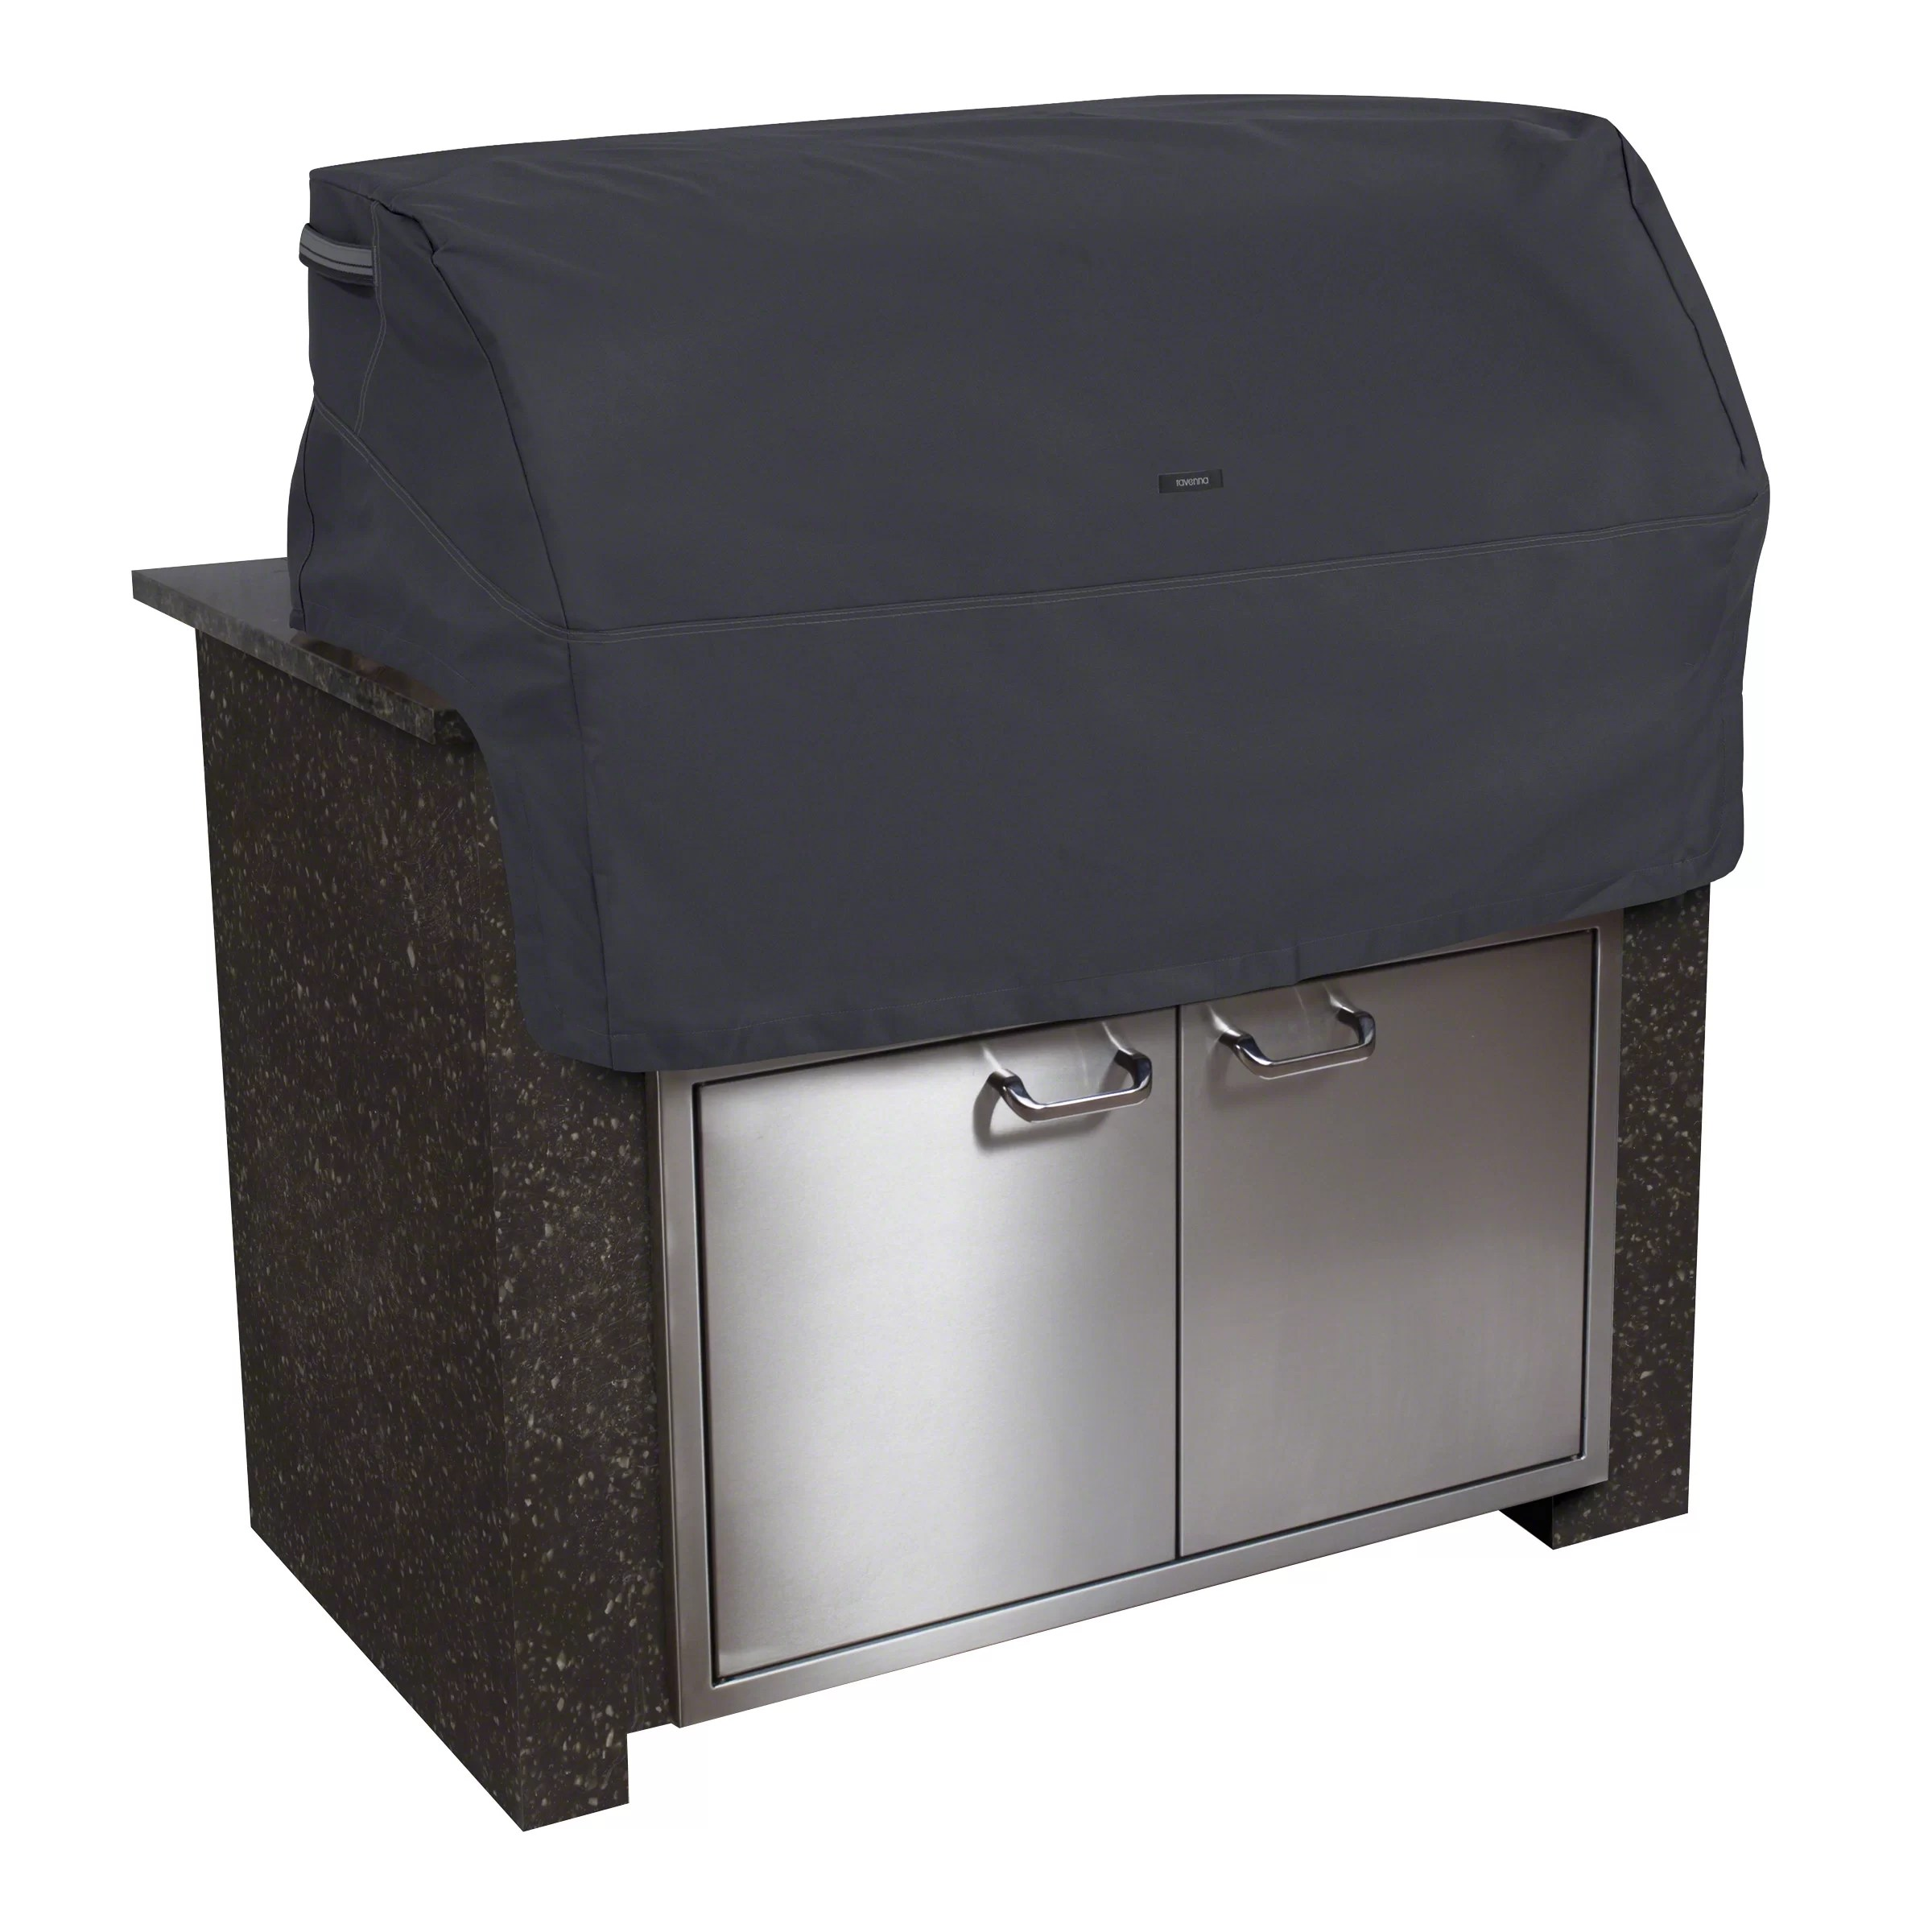 https www wayfair com storage organization pdp arlmont co kristian patio bbq grill top cover w000231799 html